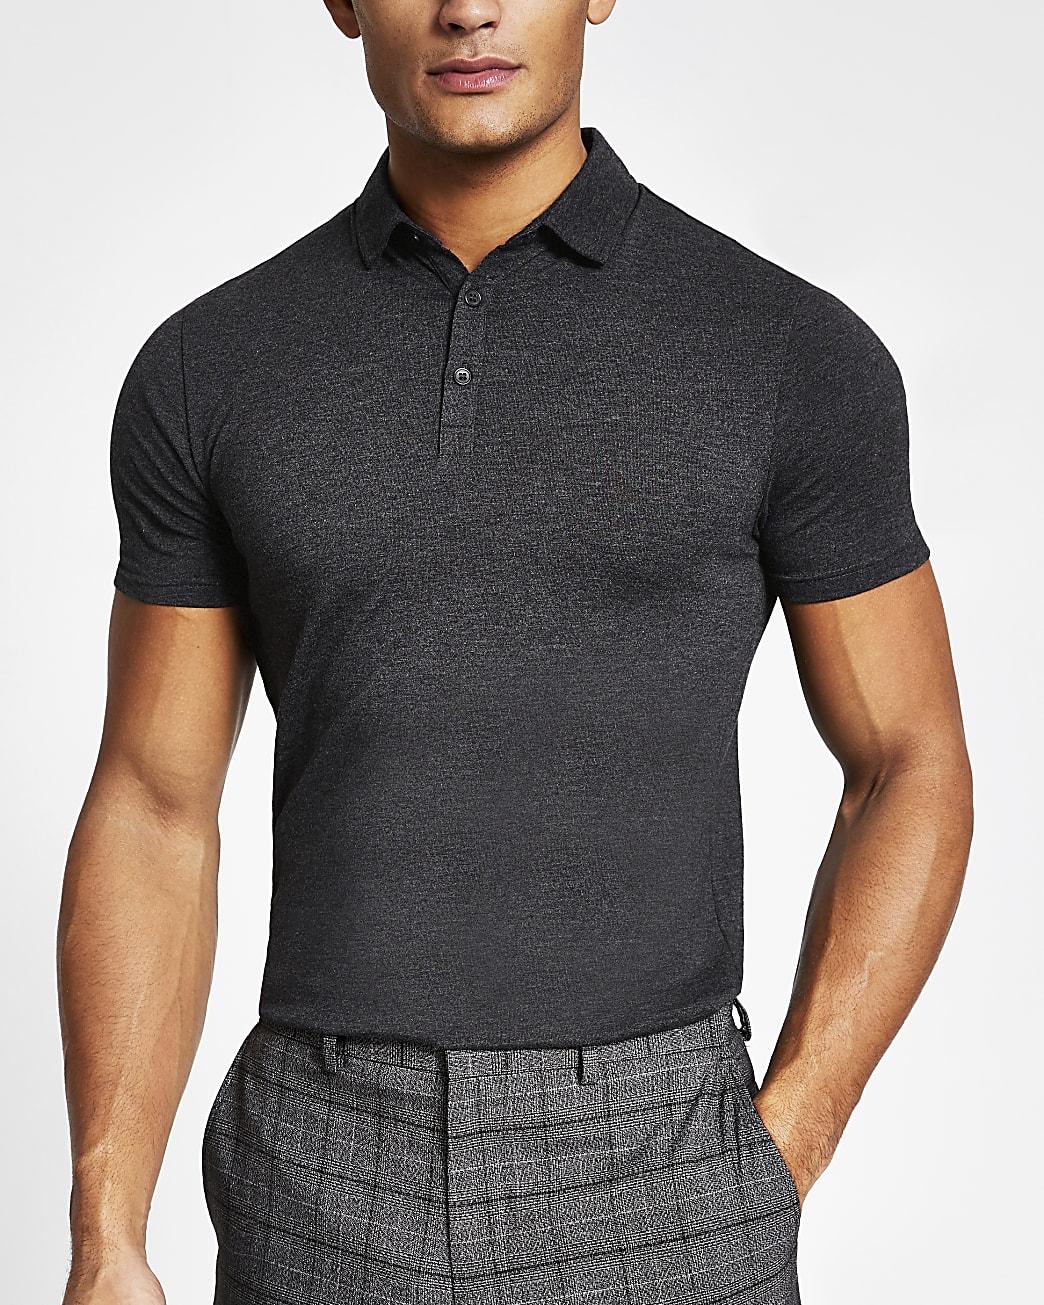 Dark grey muscle fit short sleeve polo shirt